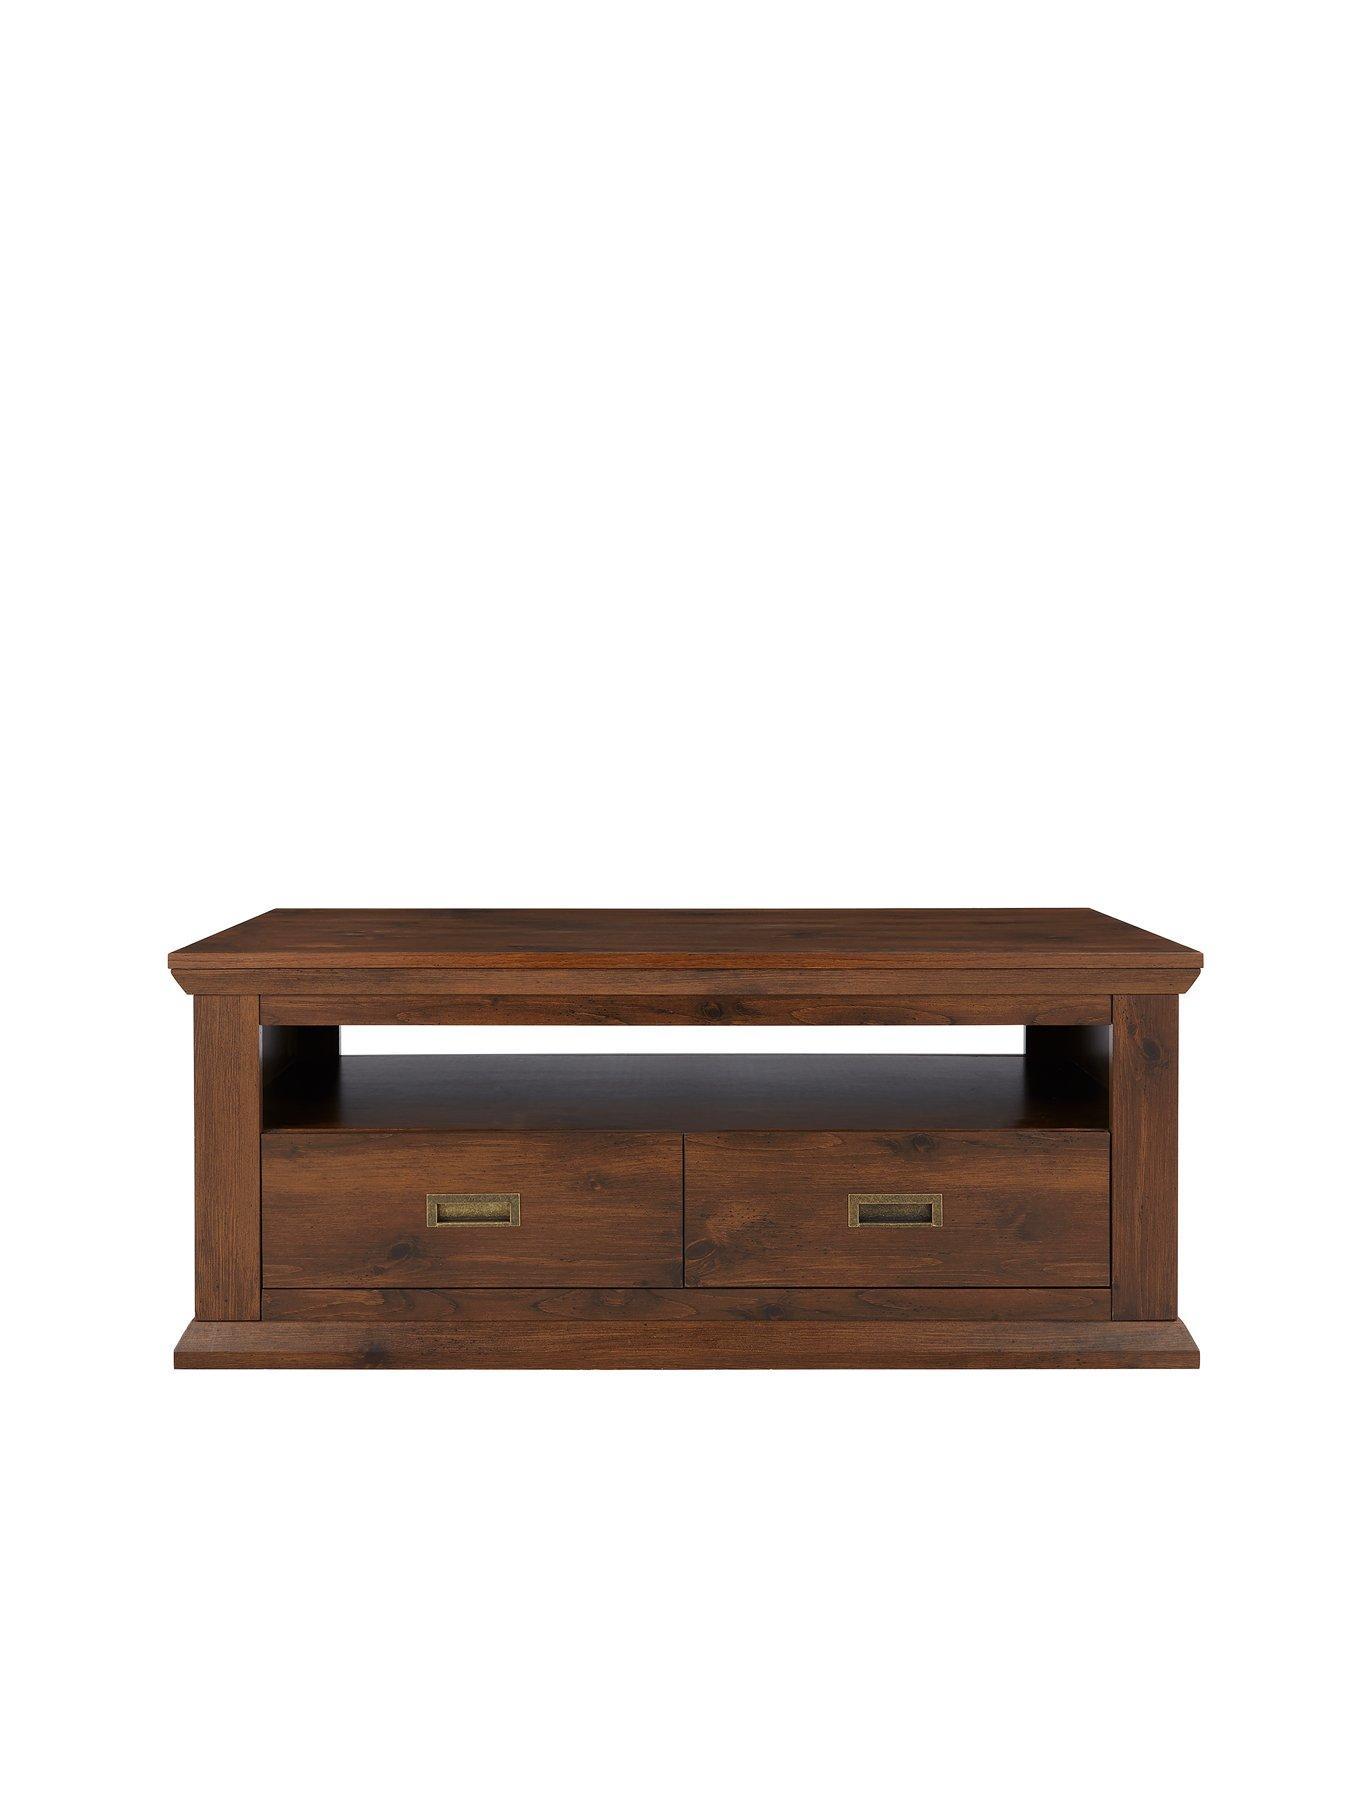 walnut furniture living room modular storage home garden very co uk clifton coffee table